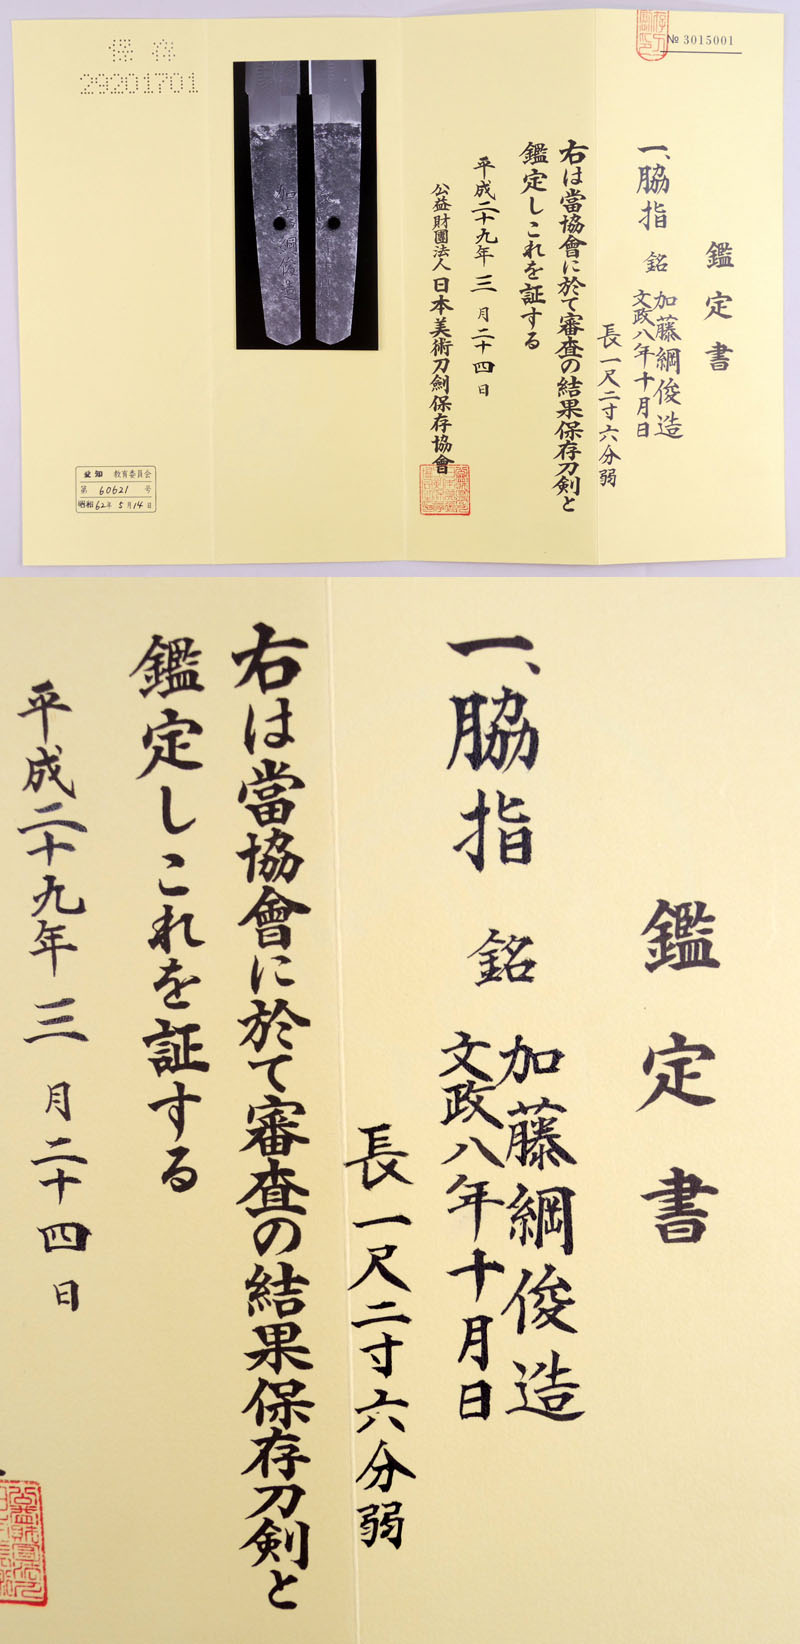 加藤綱俊造(初代綱俊) Picture of Certificate